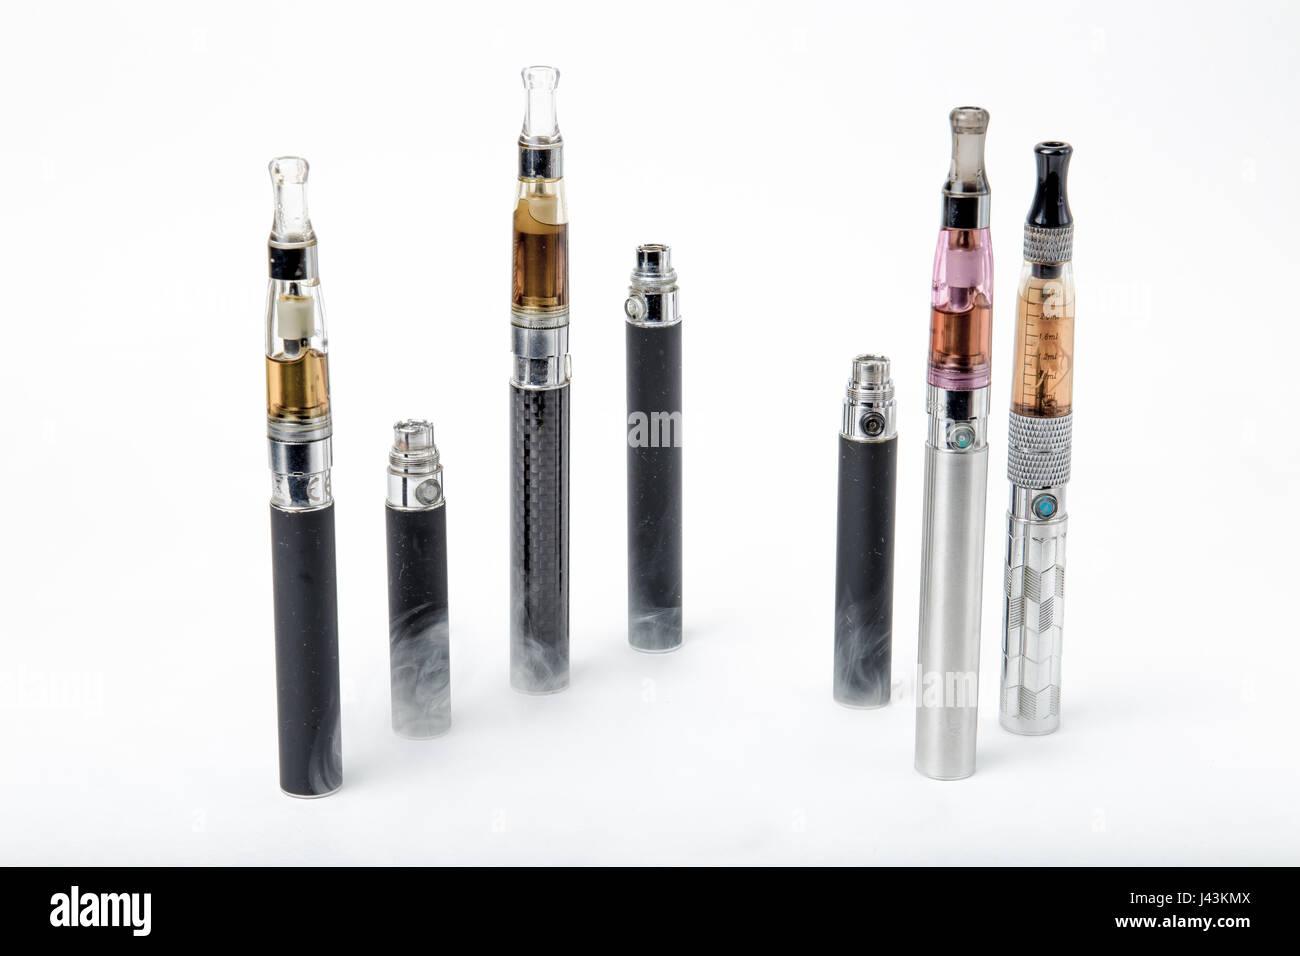 Thin e-cigarettes and smoke on white background - Stock Image